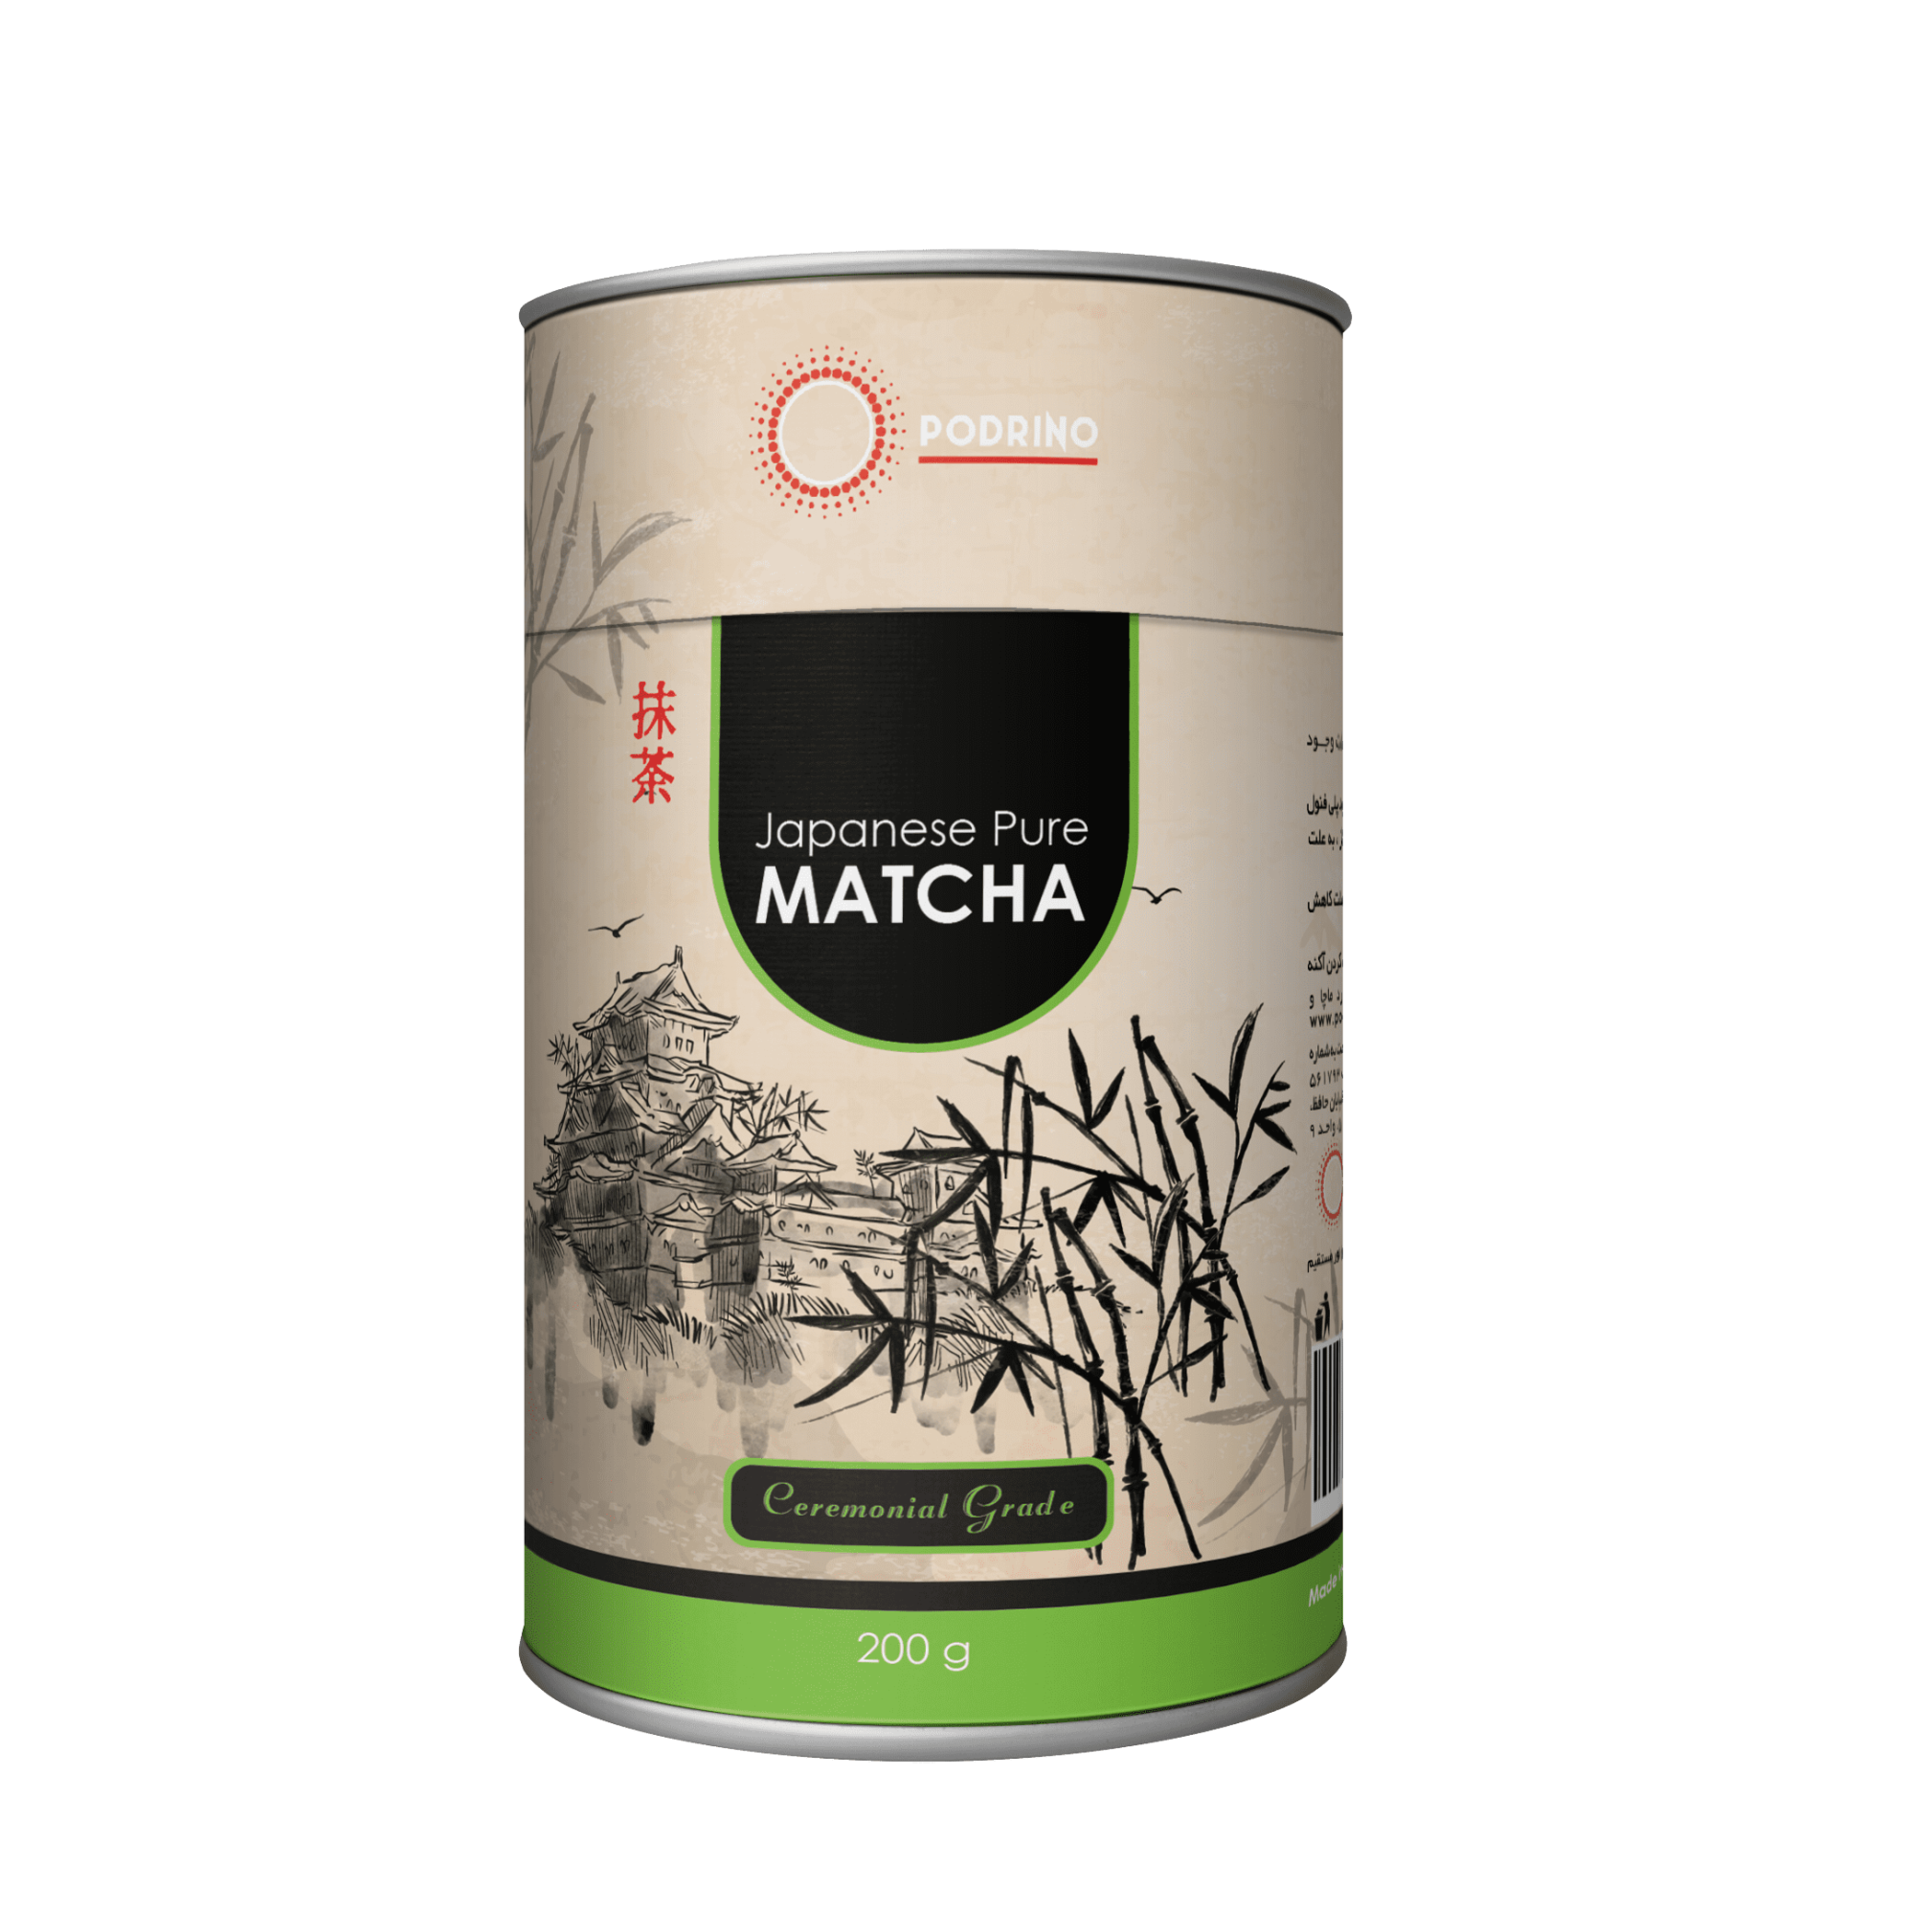 بهترین برند چای ماچا